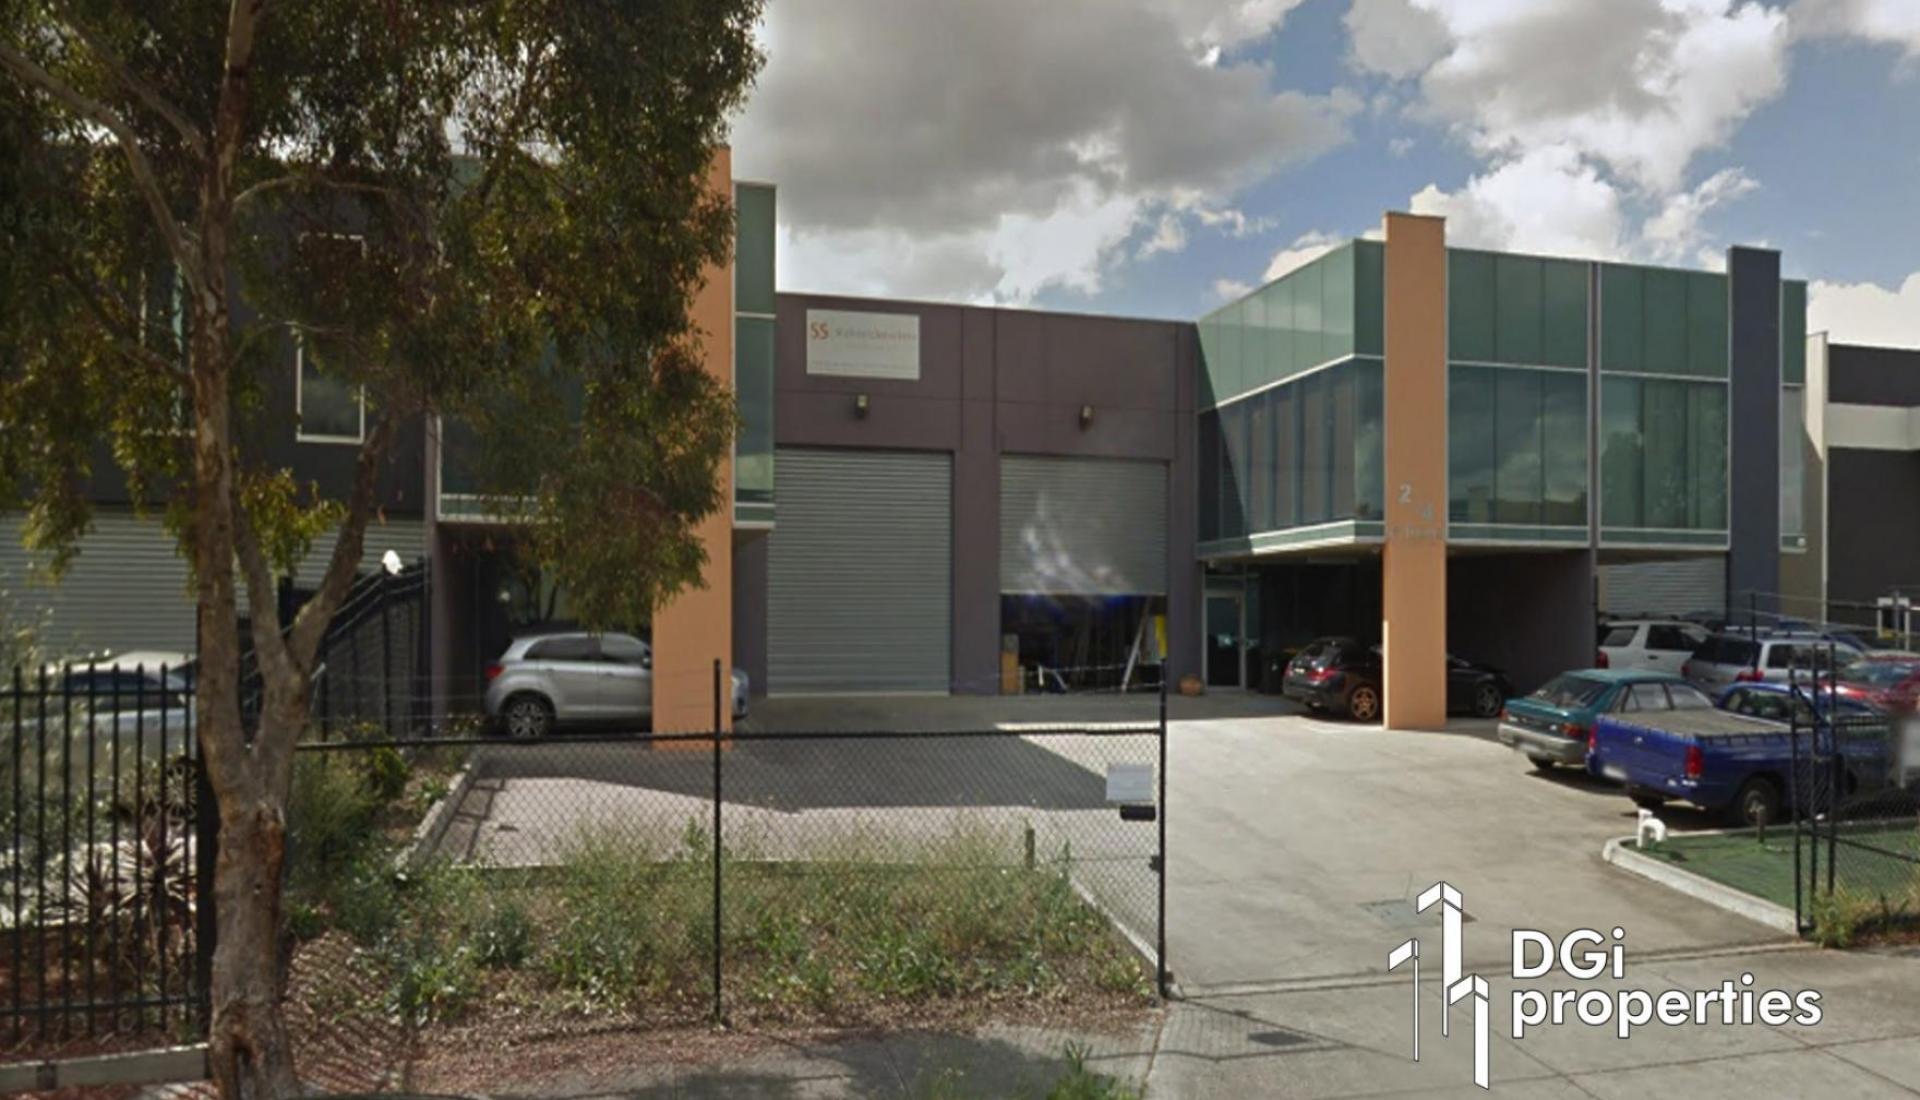 MODERN OFFICE/WAREHOUSE BUILDING